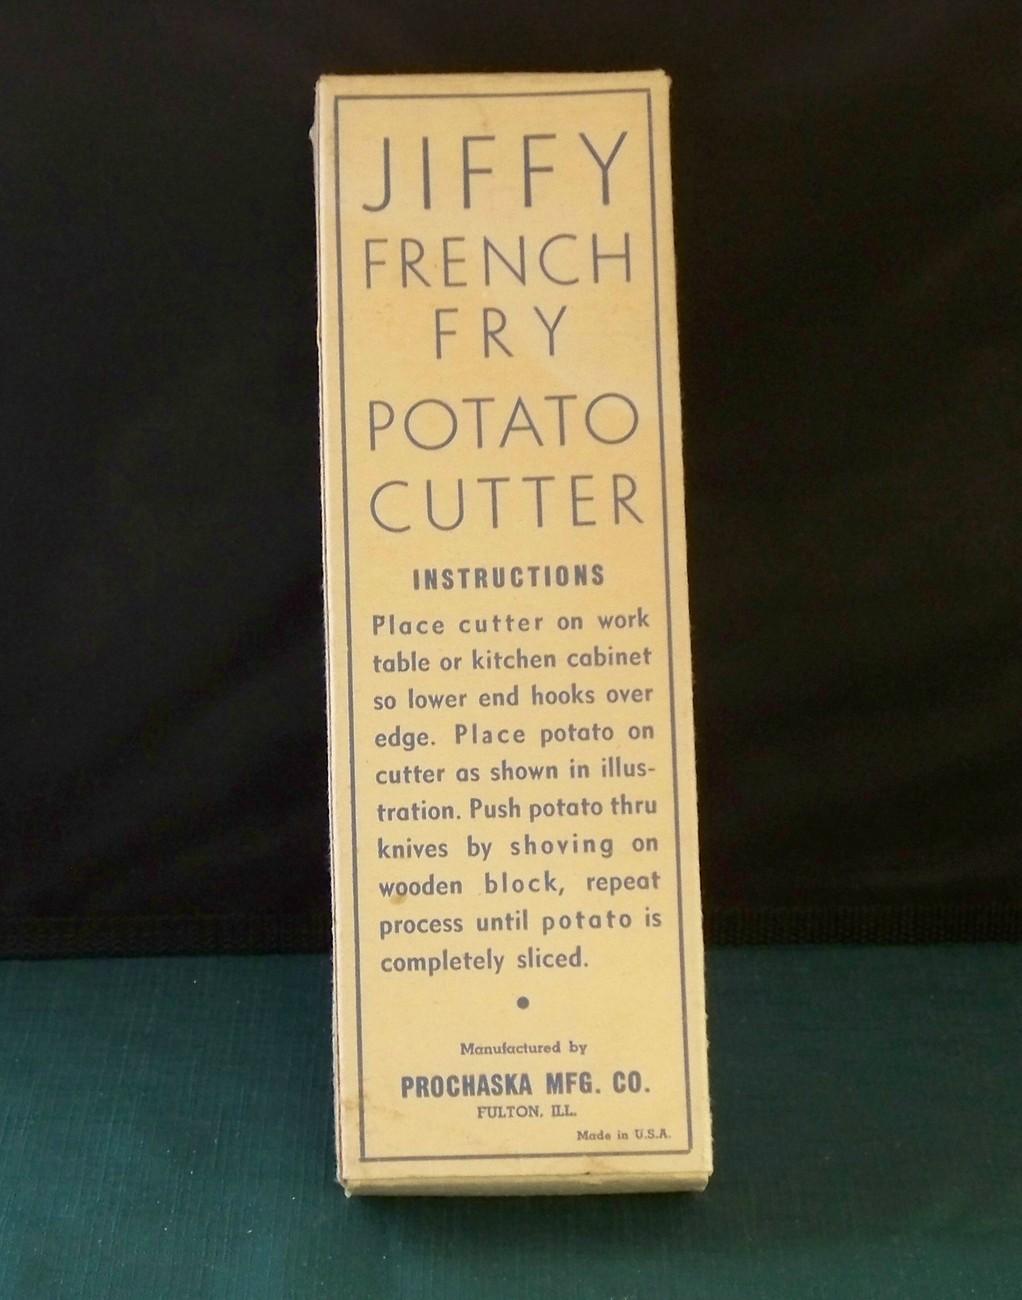 Jiffy French Fry Potato Cutter Original Box Very Clean